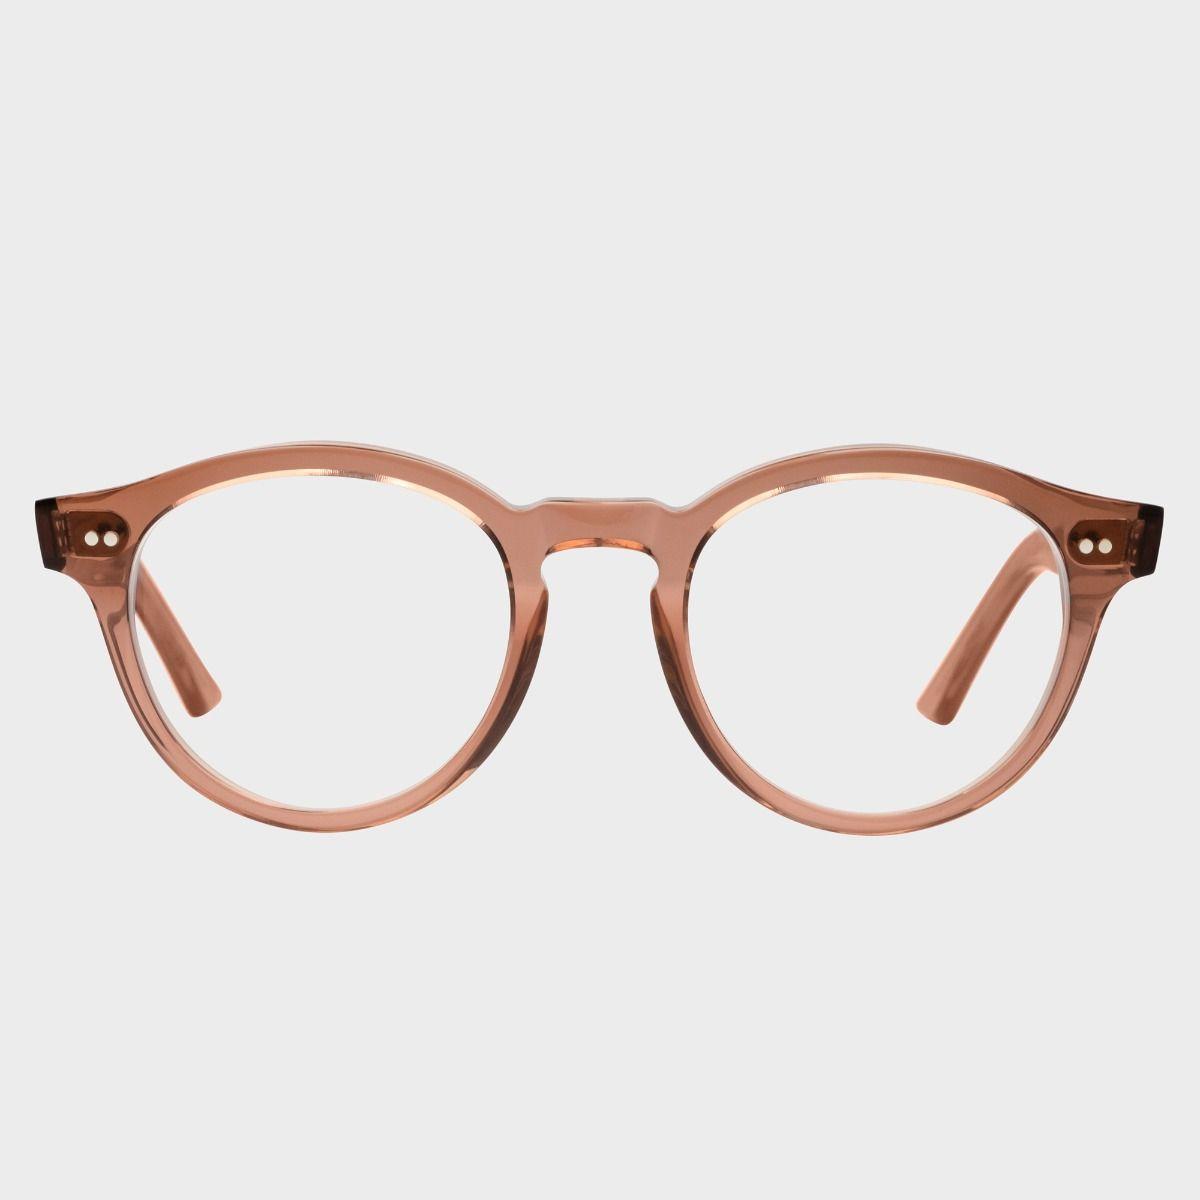 1378 Blue Light Filter Optical Round Glasses-Rhubarb